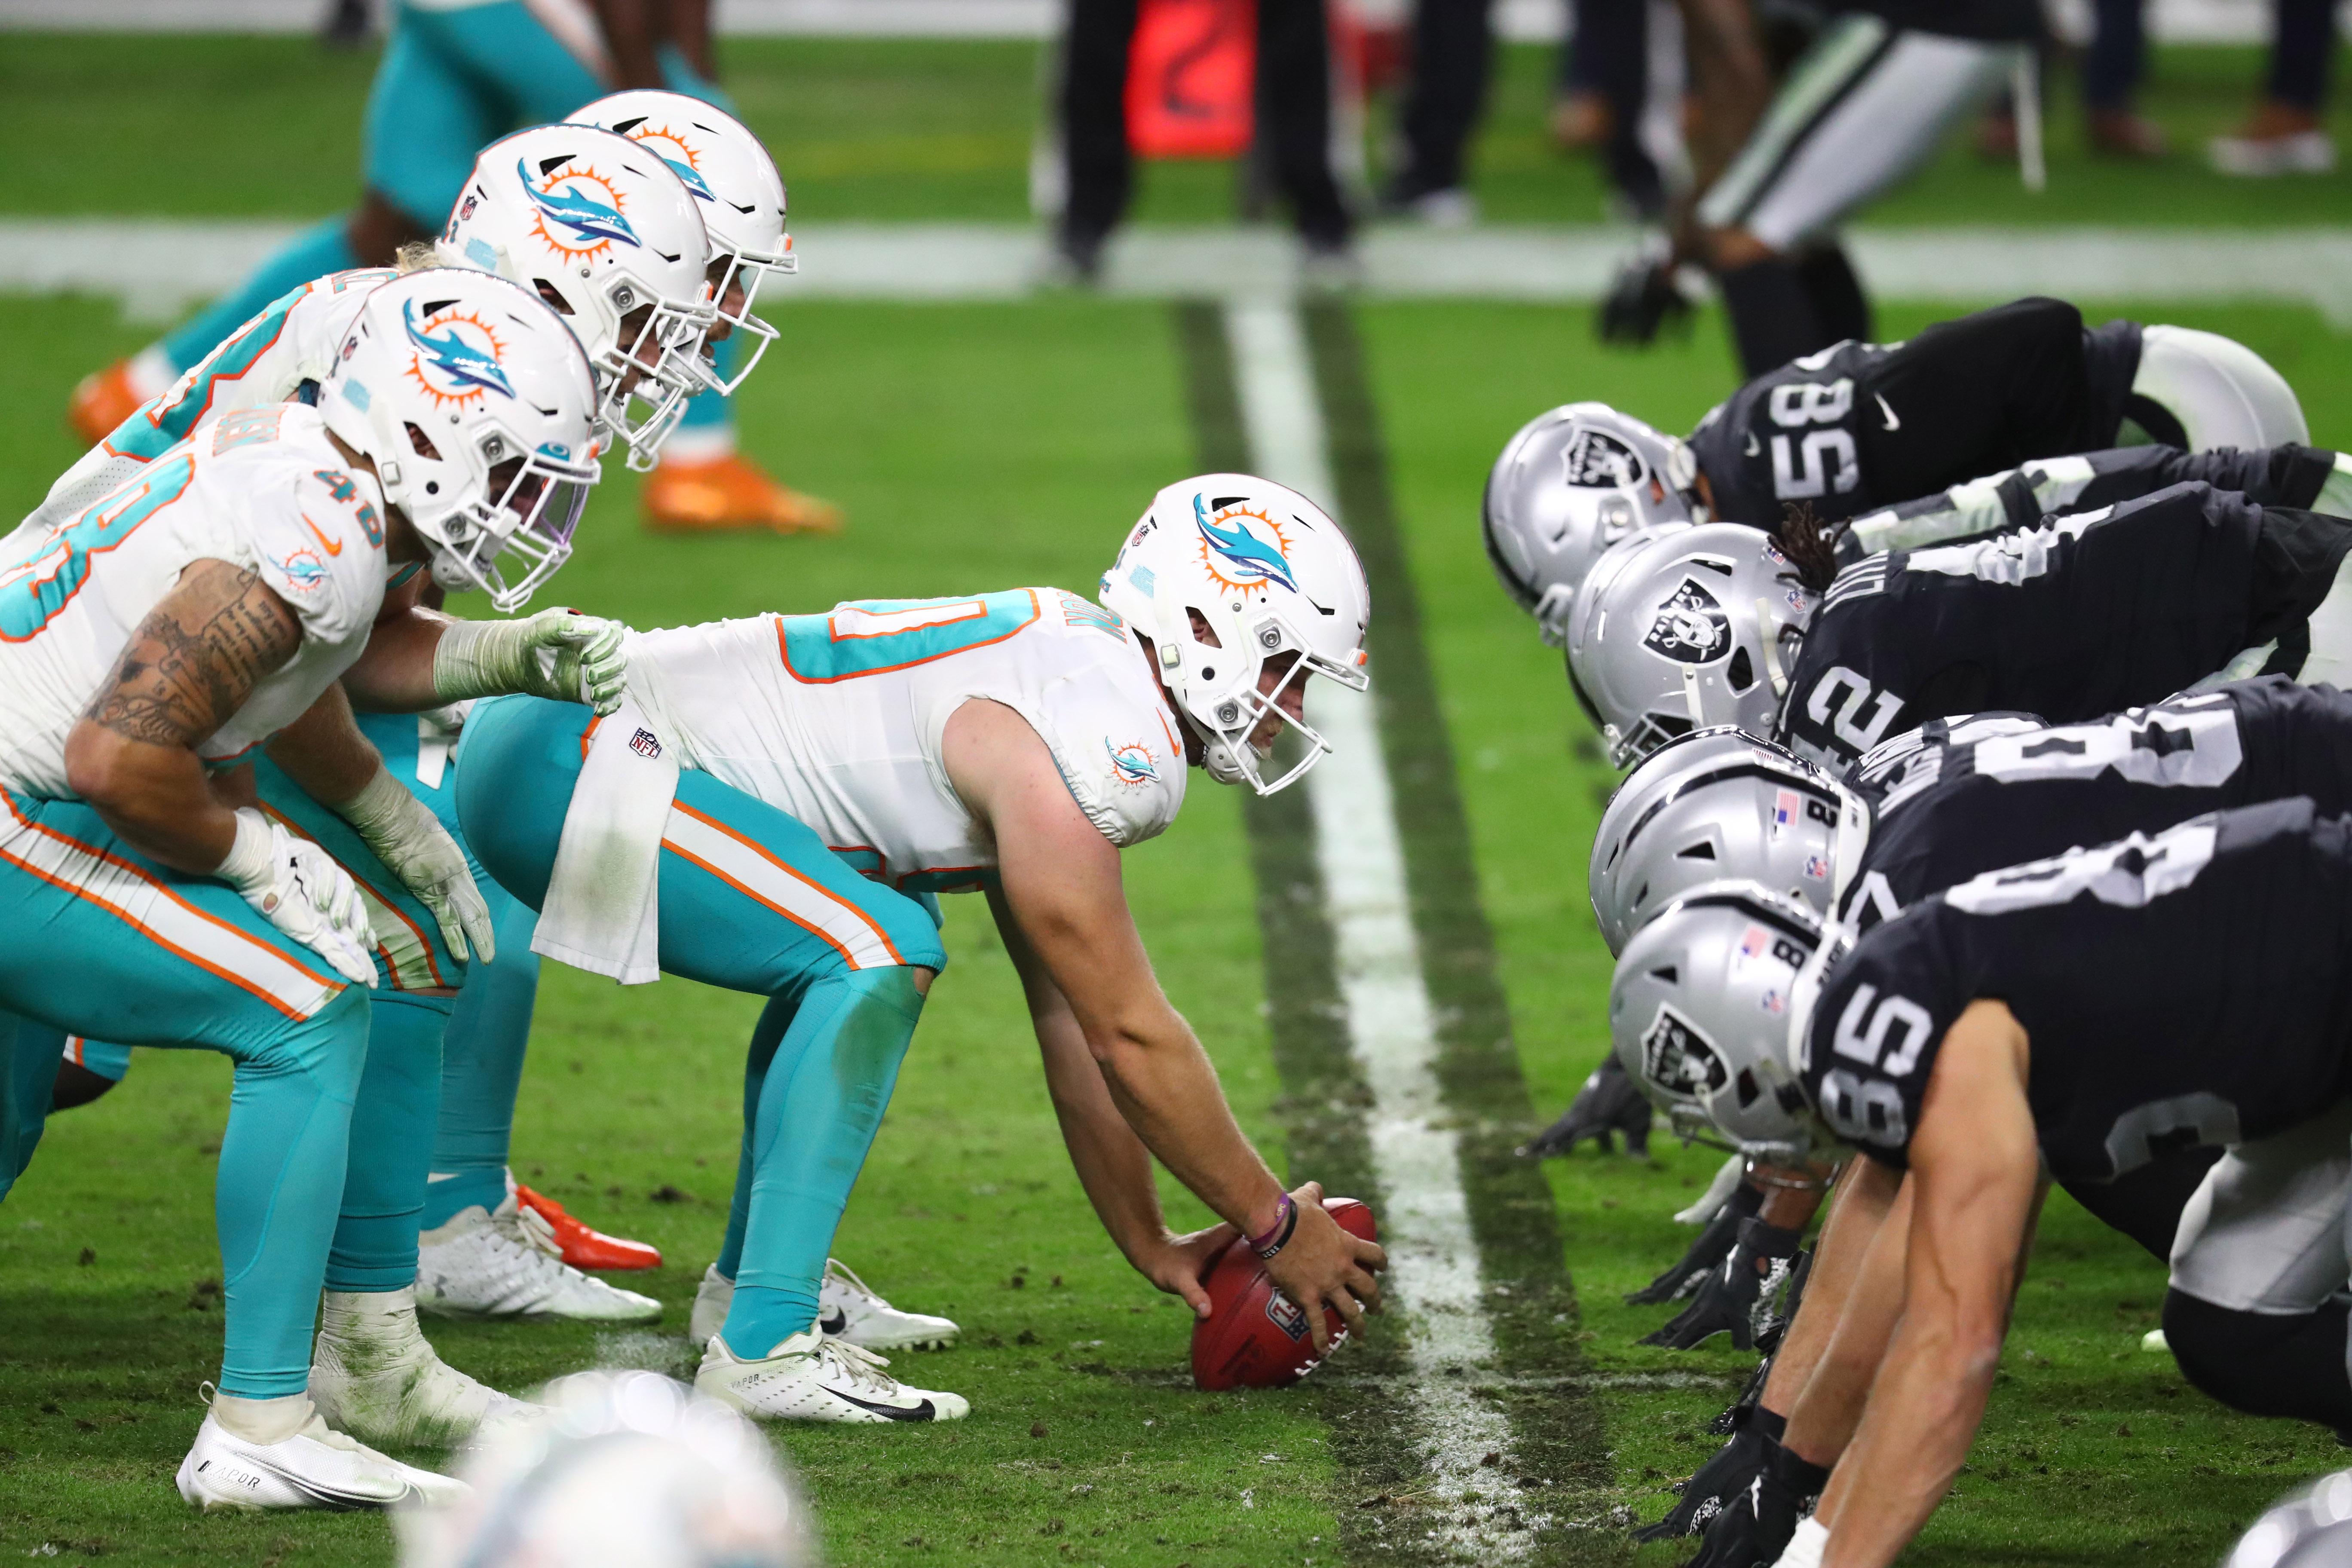 NFL: Miami Dolphins at Las Vegas Raiders